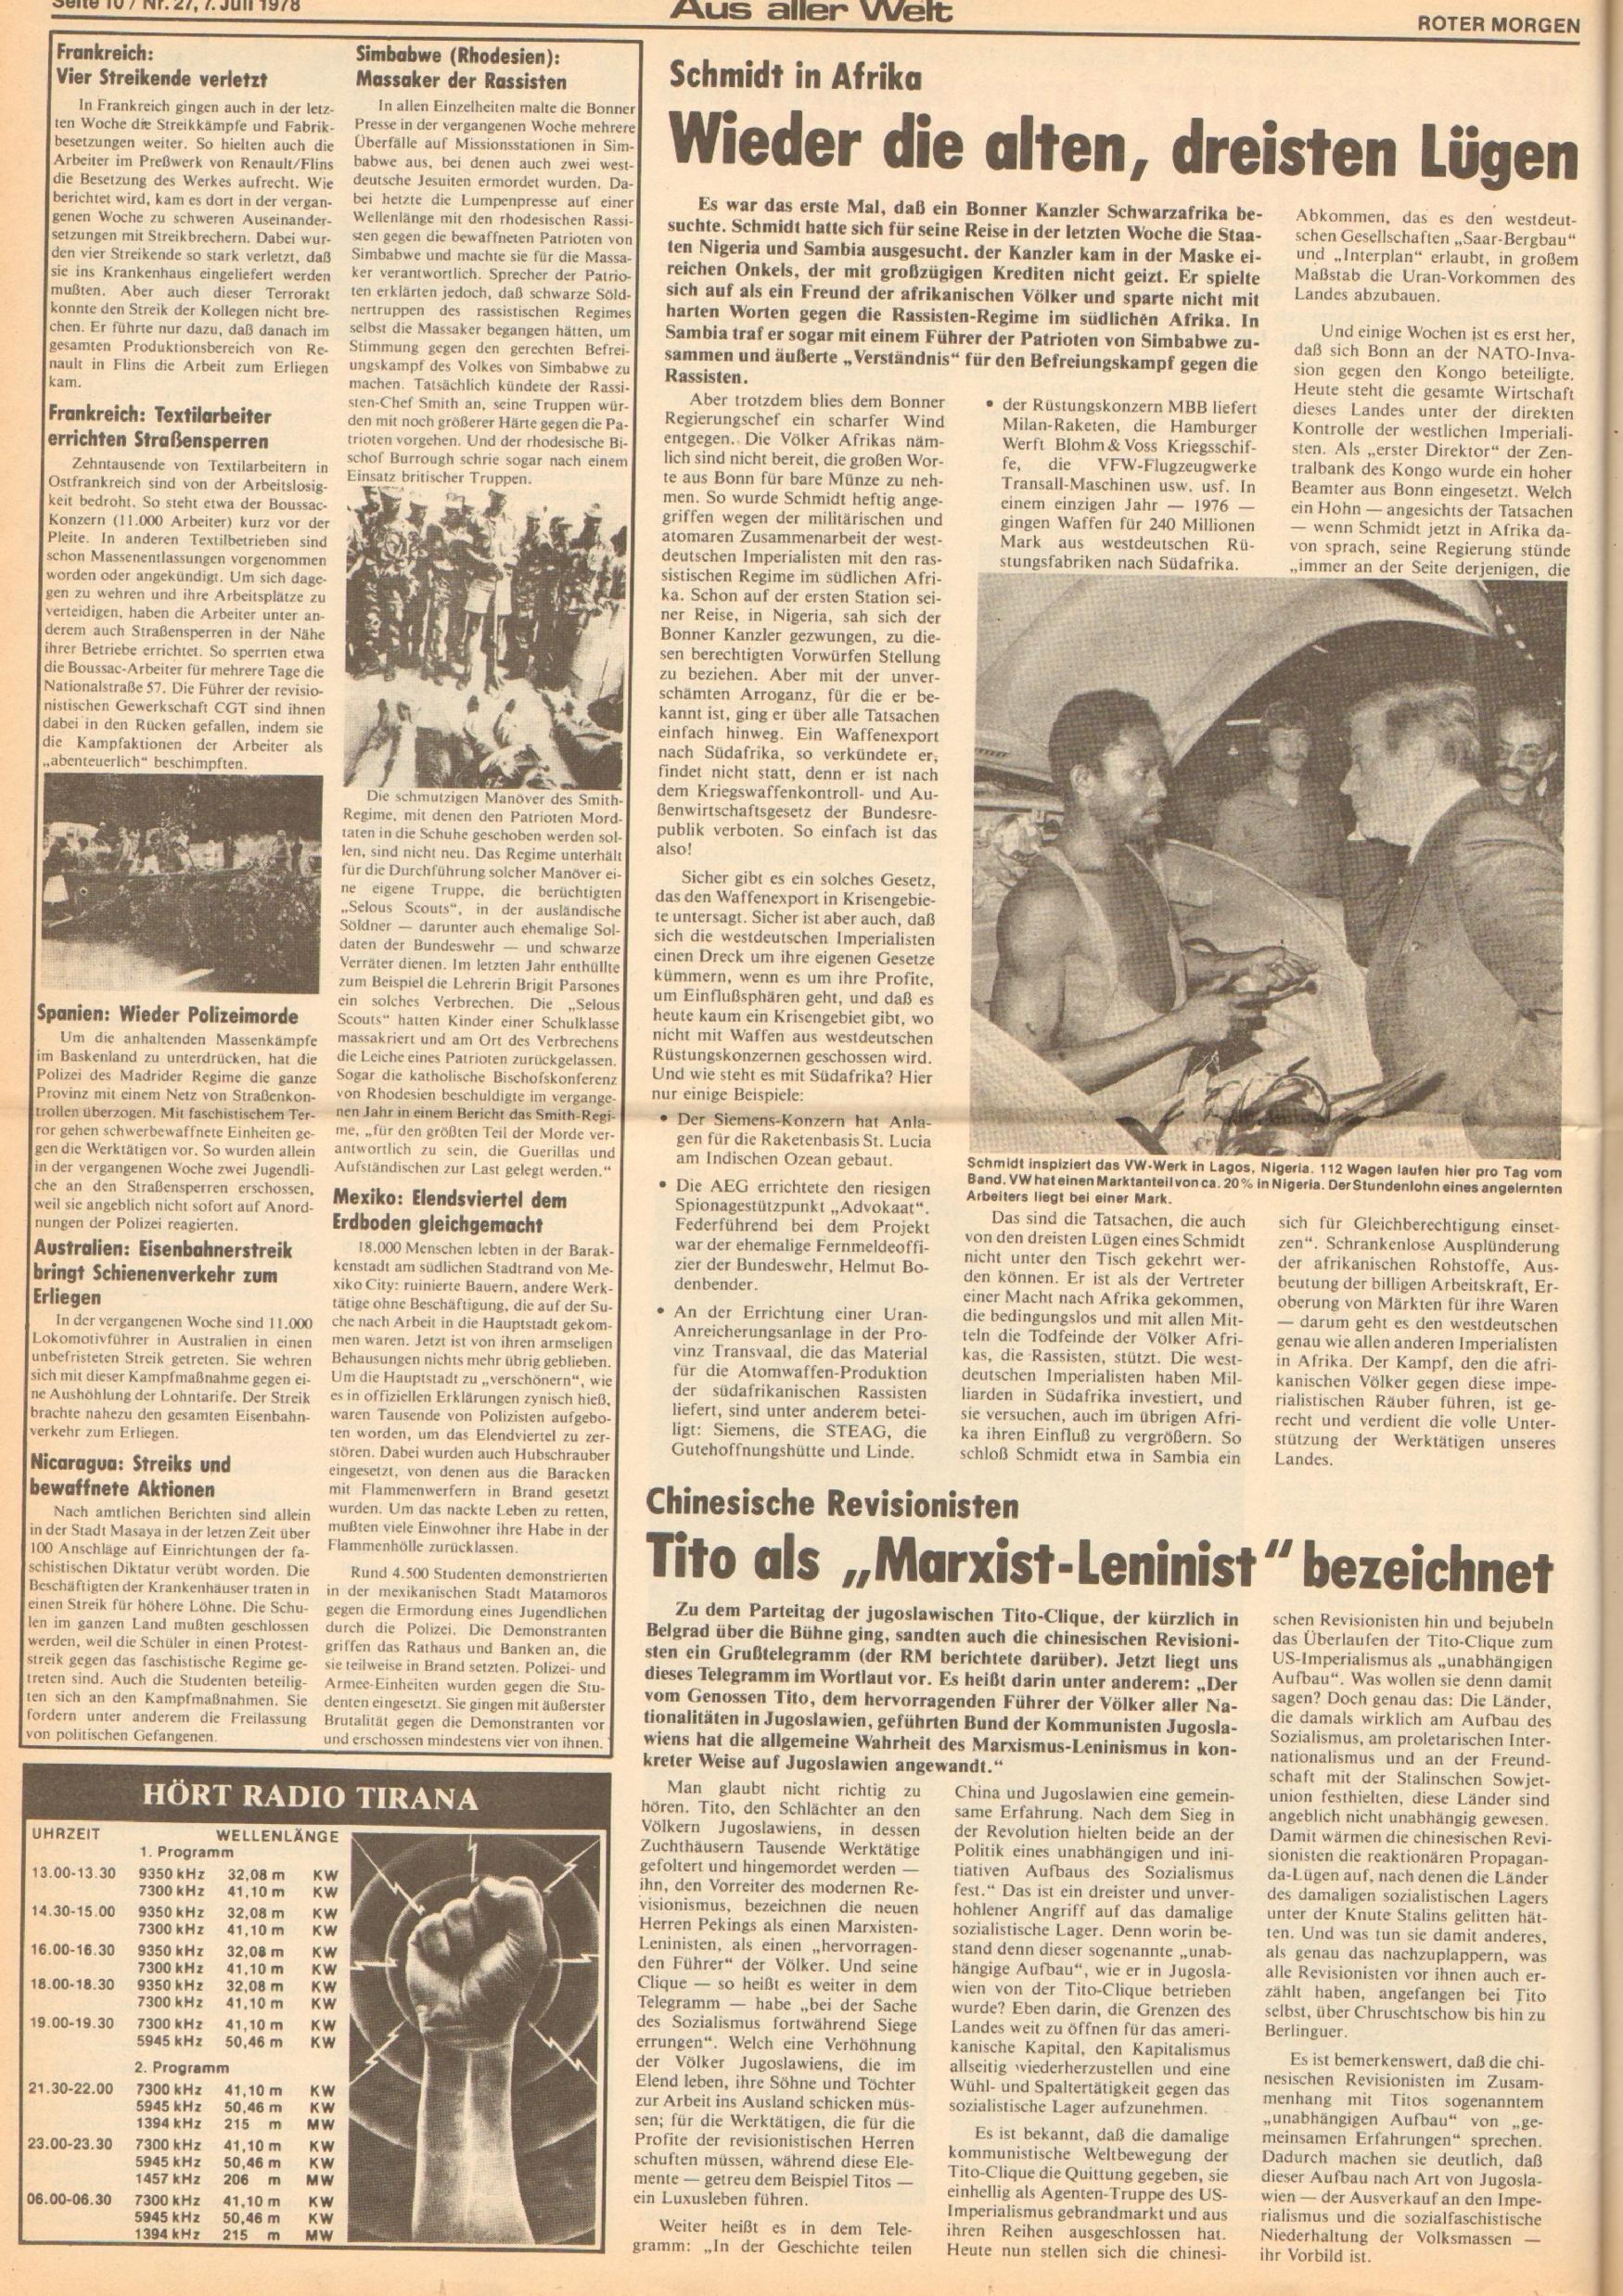 Roter Morgen, 12. Jg., 7. Juli 1978, Nr. 27, Seite 10